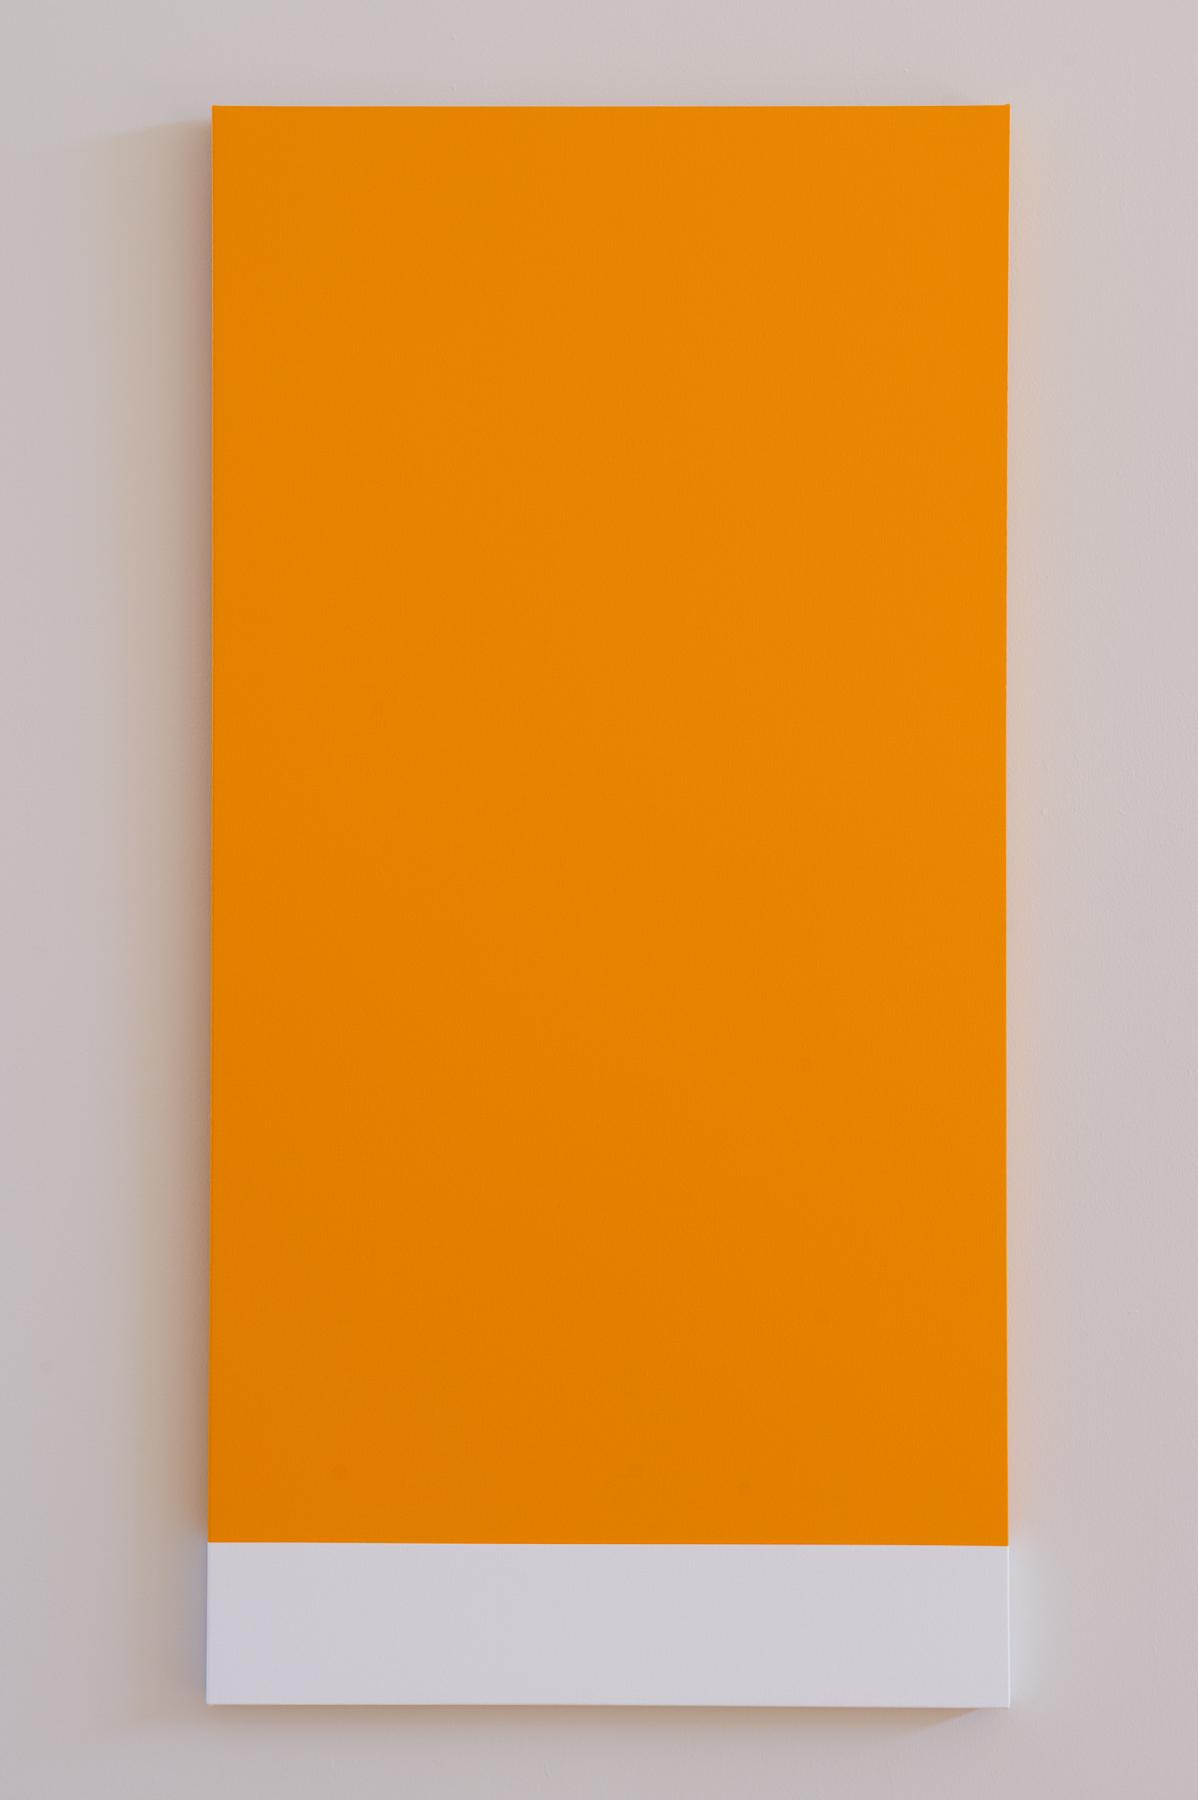 Orange Rectangle, 14-1159 (after Kelly)